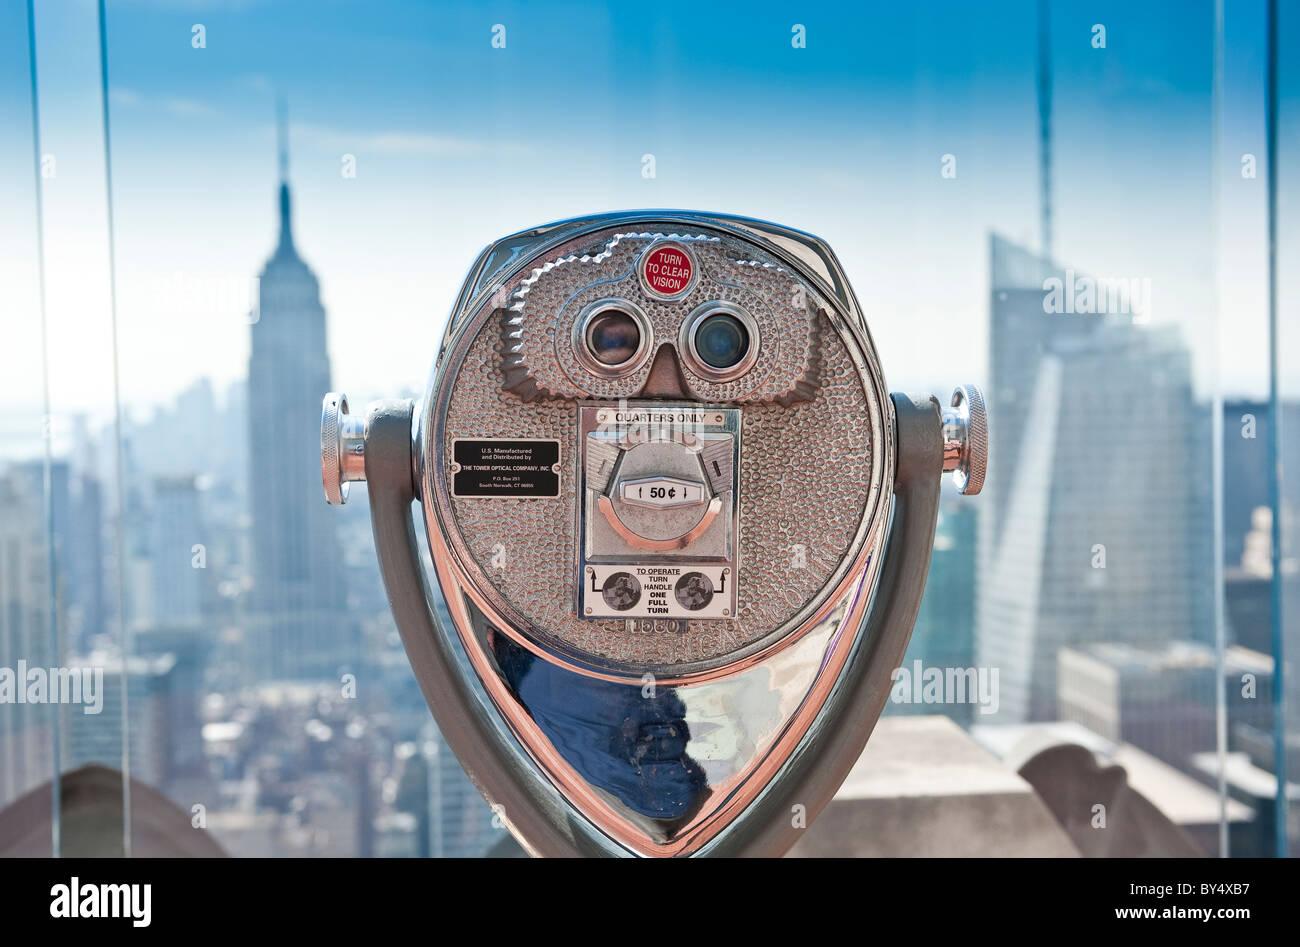 Das Rockefeller Center Aussichtsplattform, New York City. Stockbild